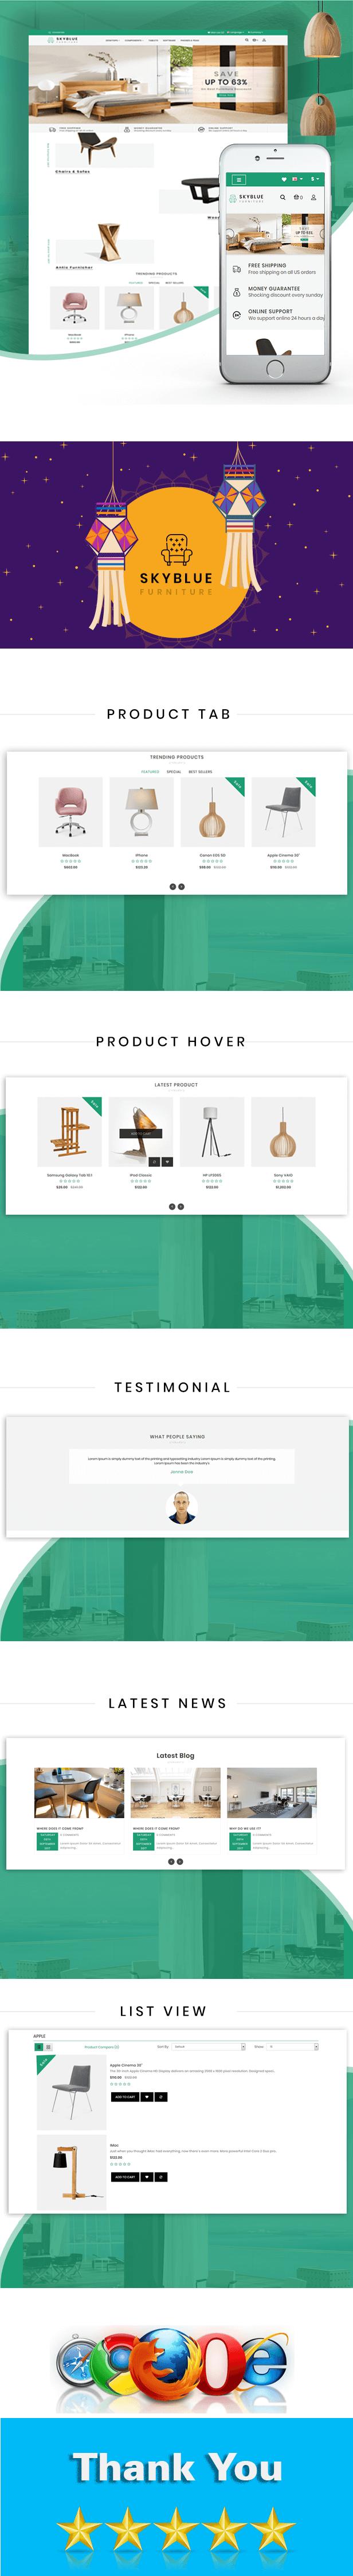 Skyblue Furniture and Home Decor Prestashop Theme - 1